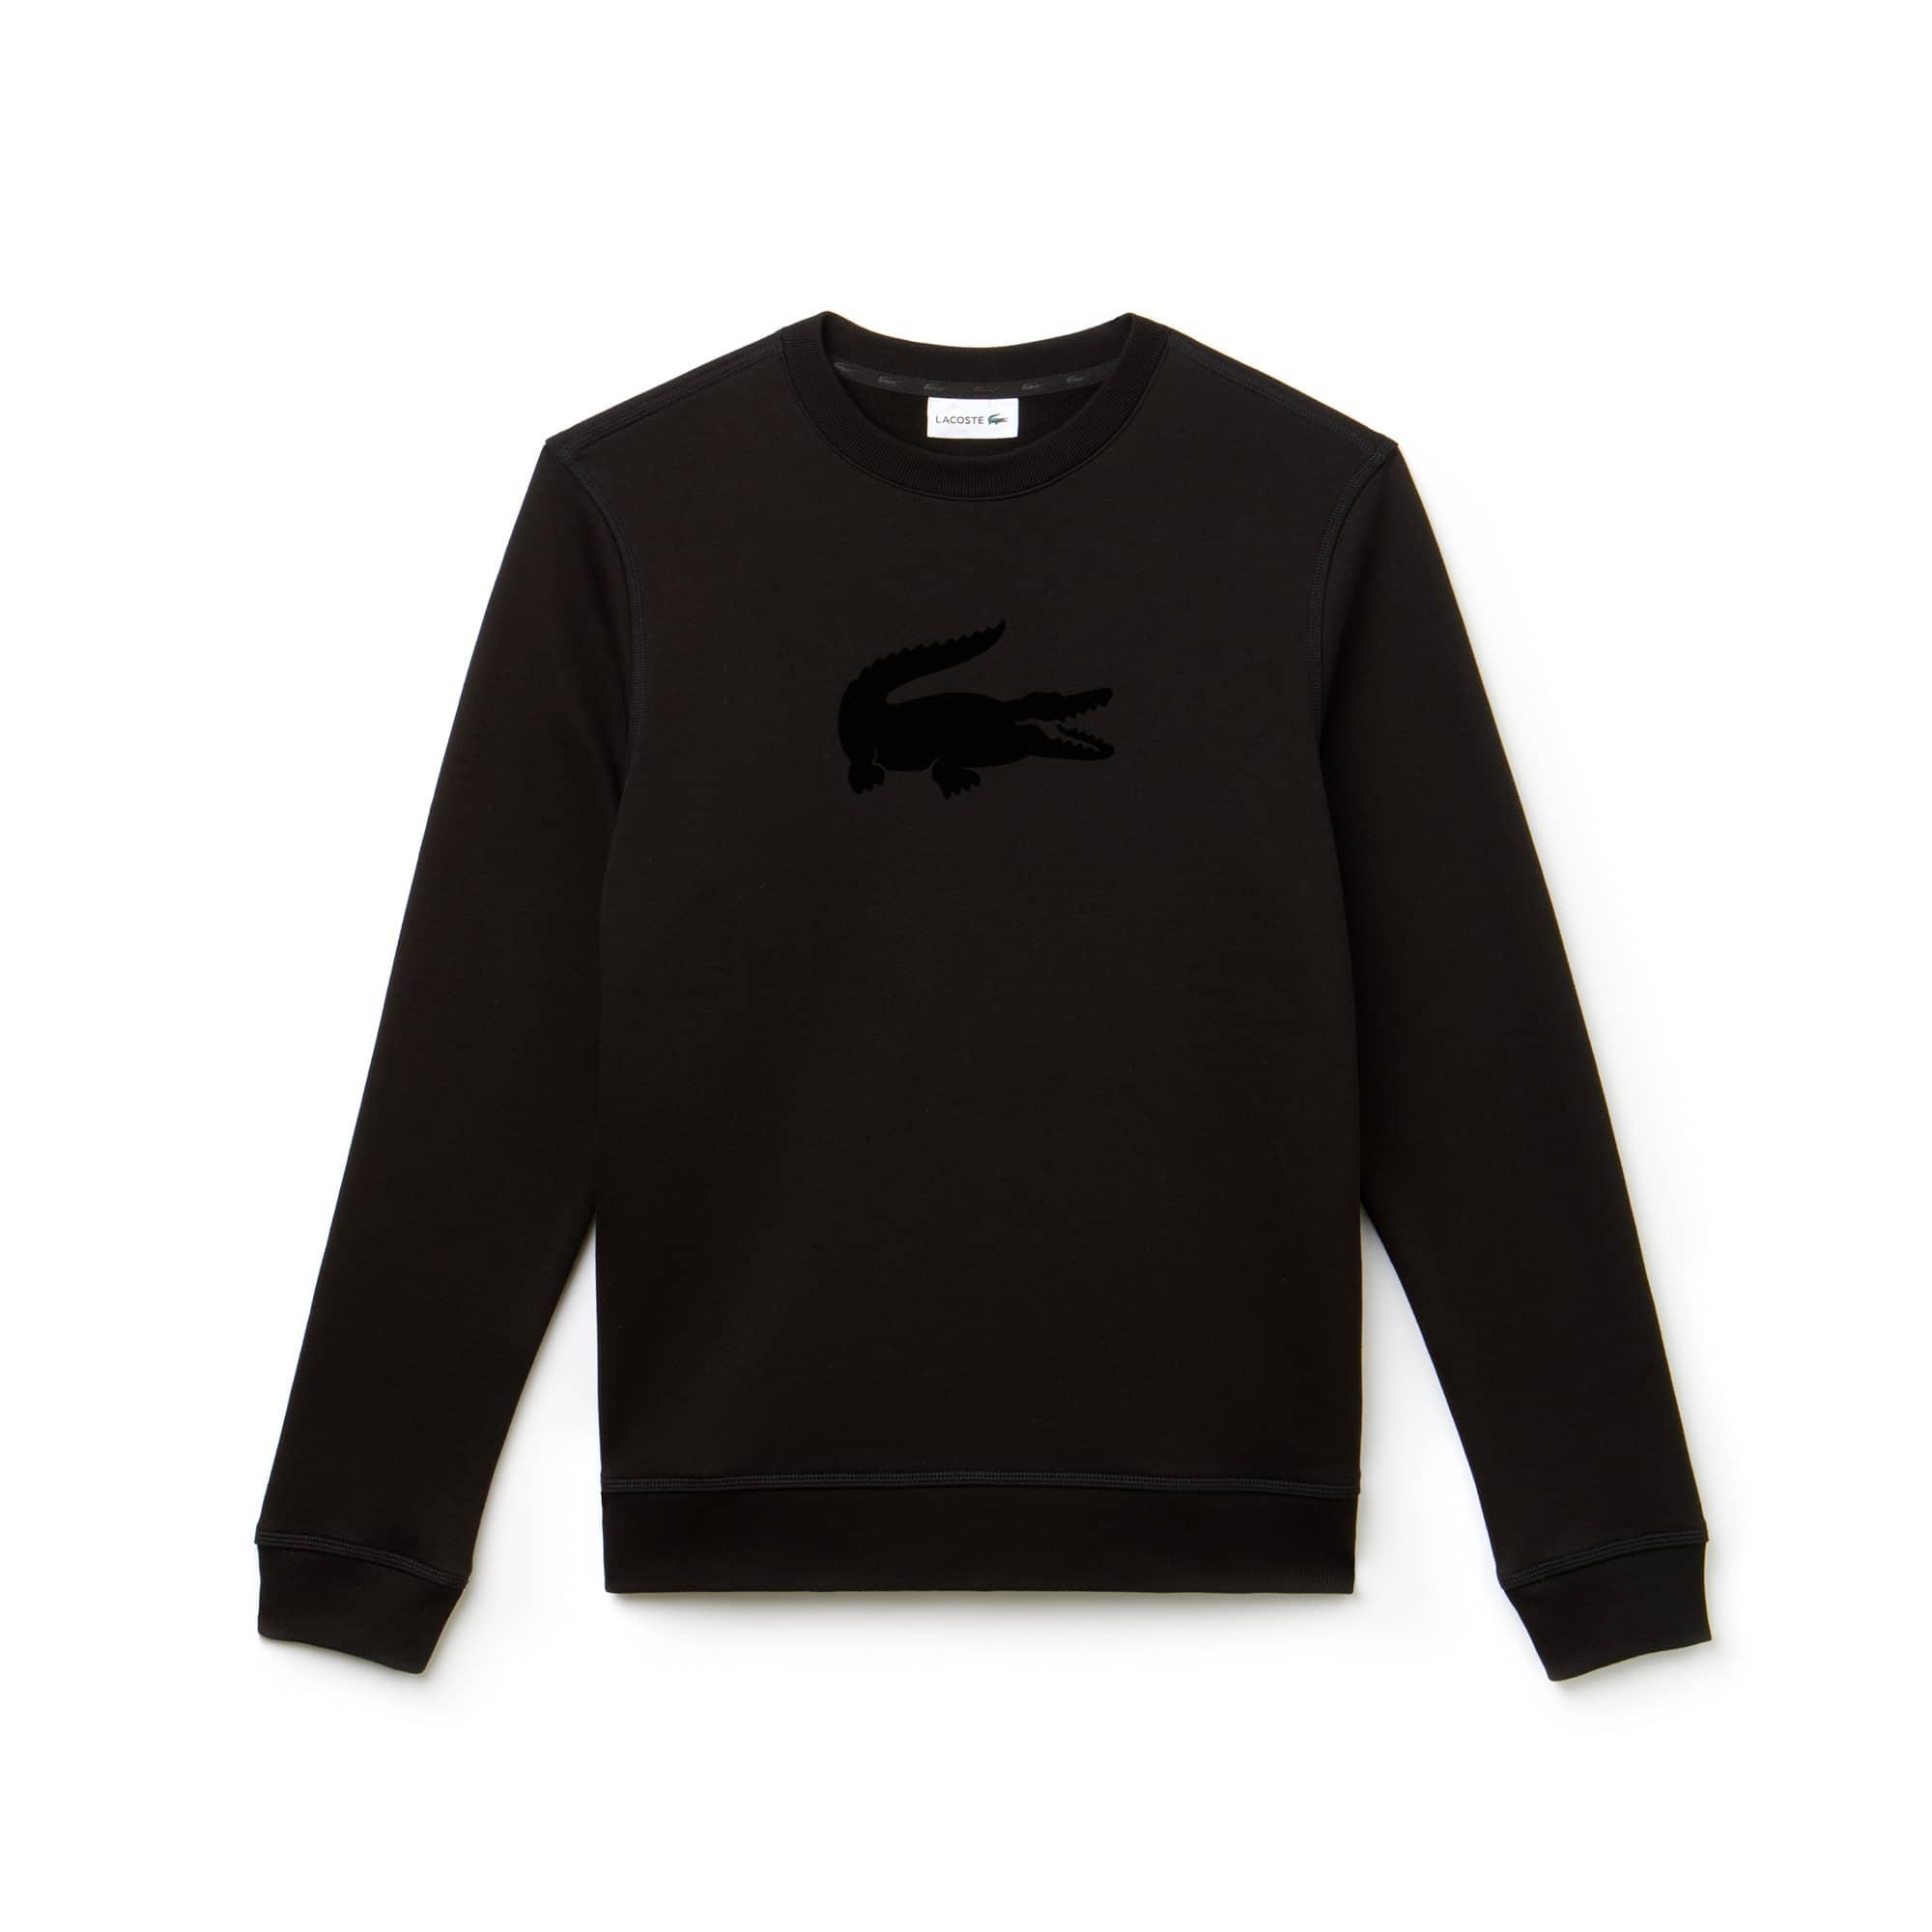 Men's Crew Neck Felt Crocodile Fleece Sweatshirt